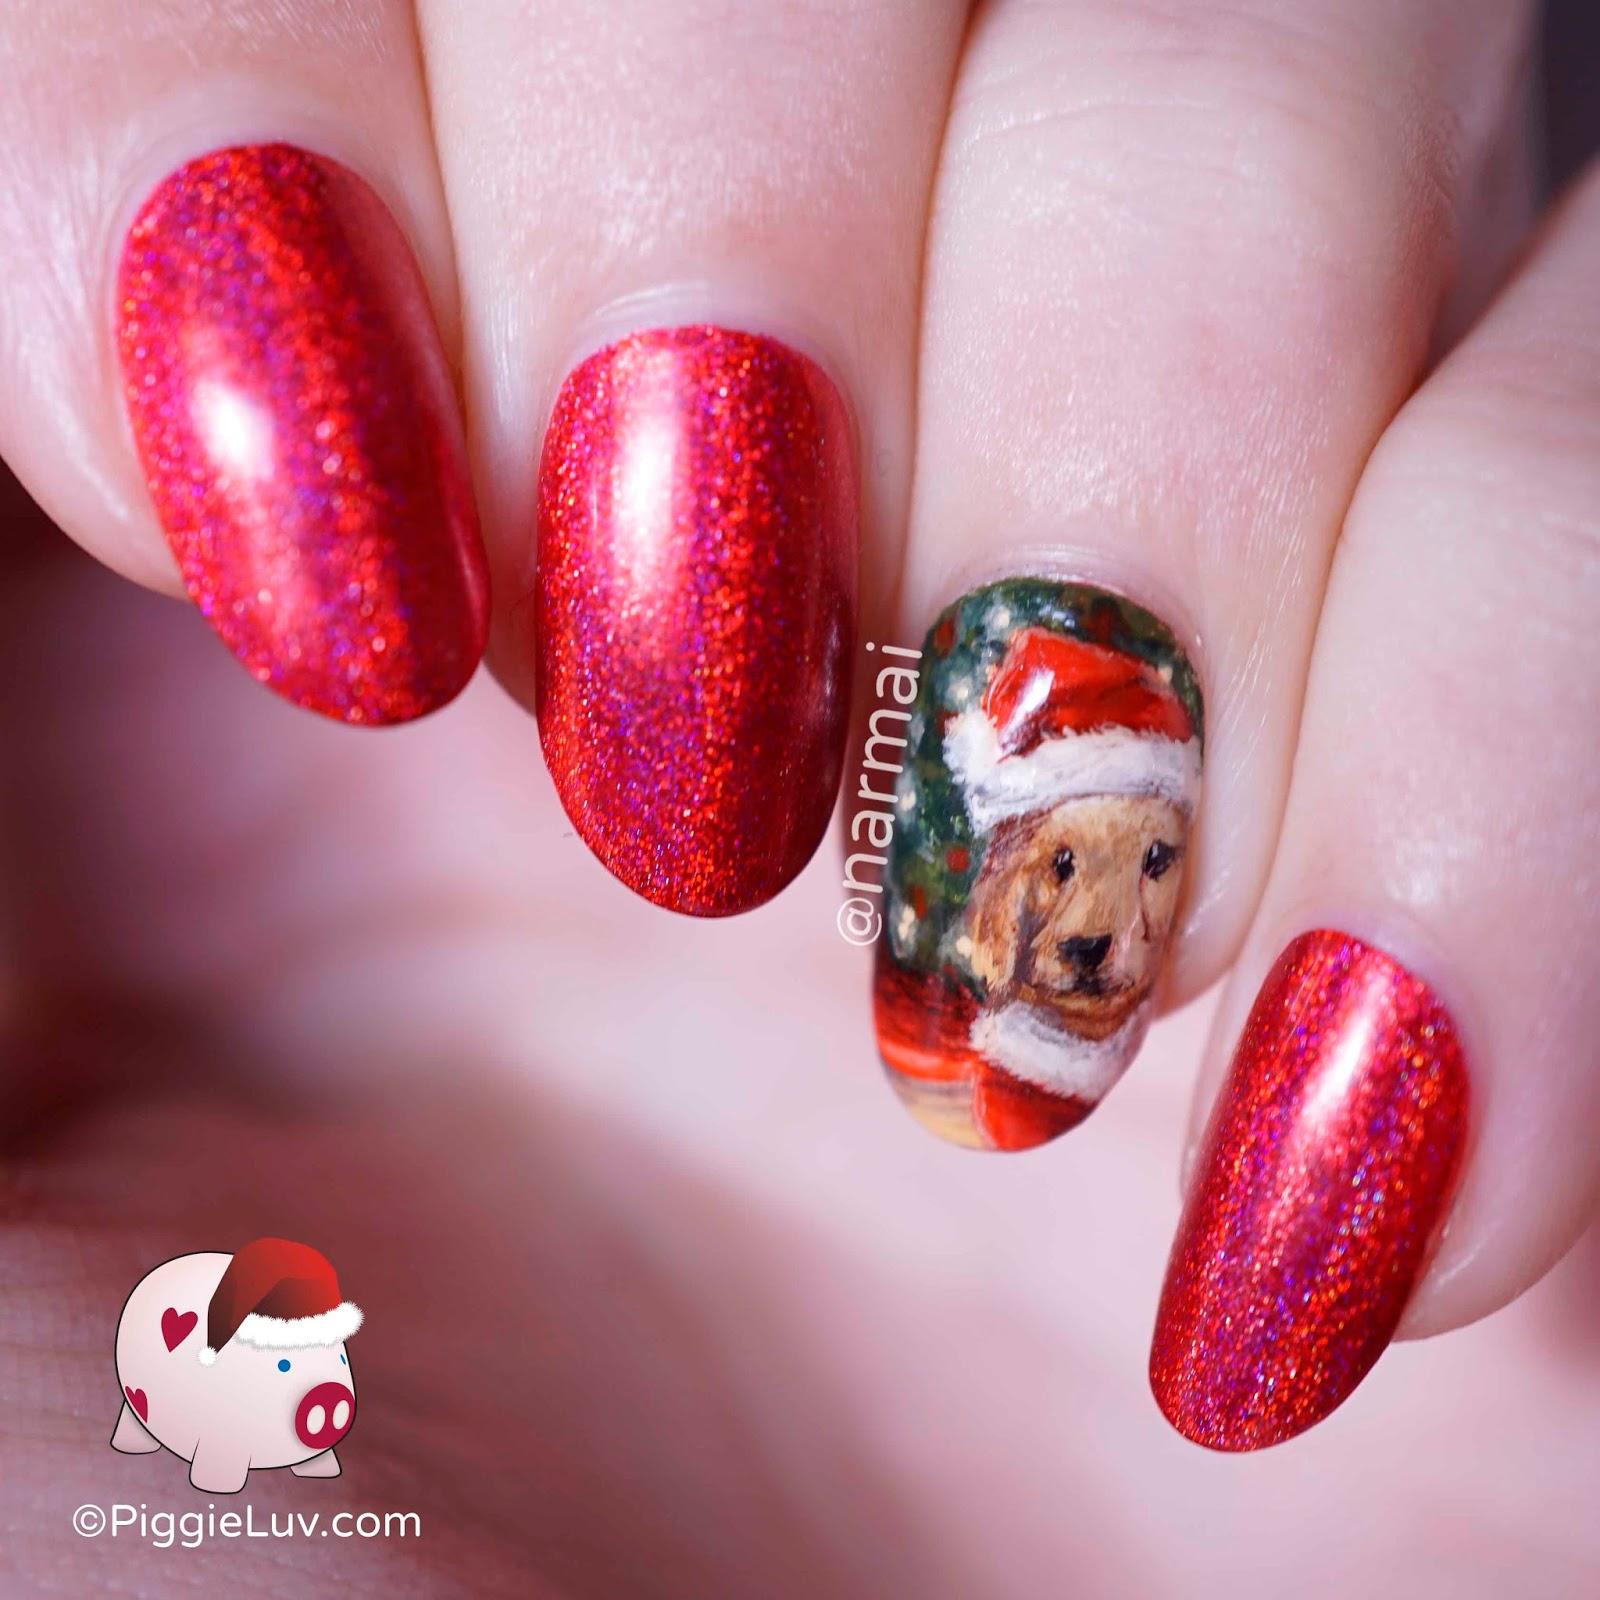 Christmas Nail Art Designs Gallery: PiggieLuv: Nail Art Gallery